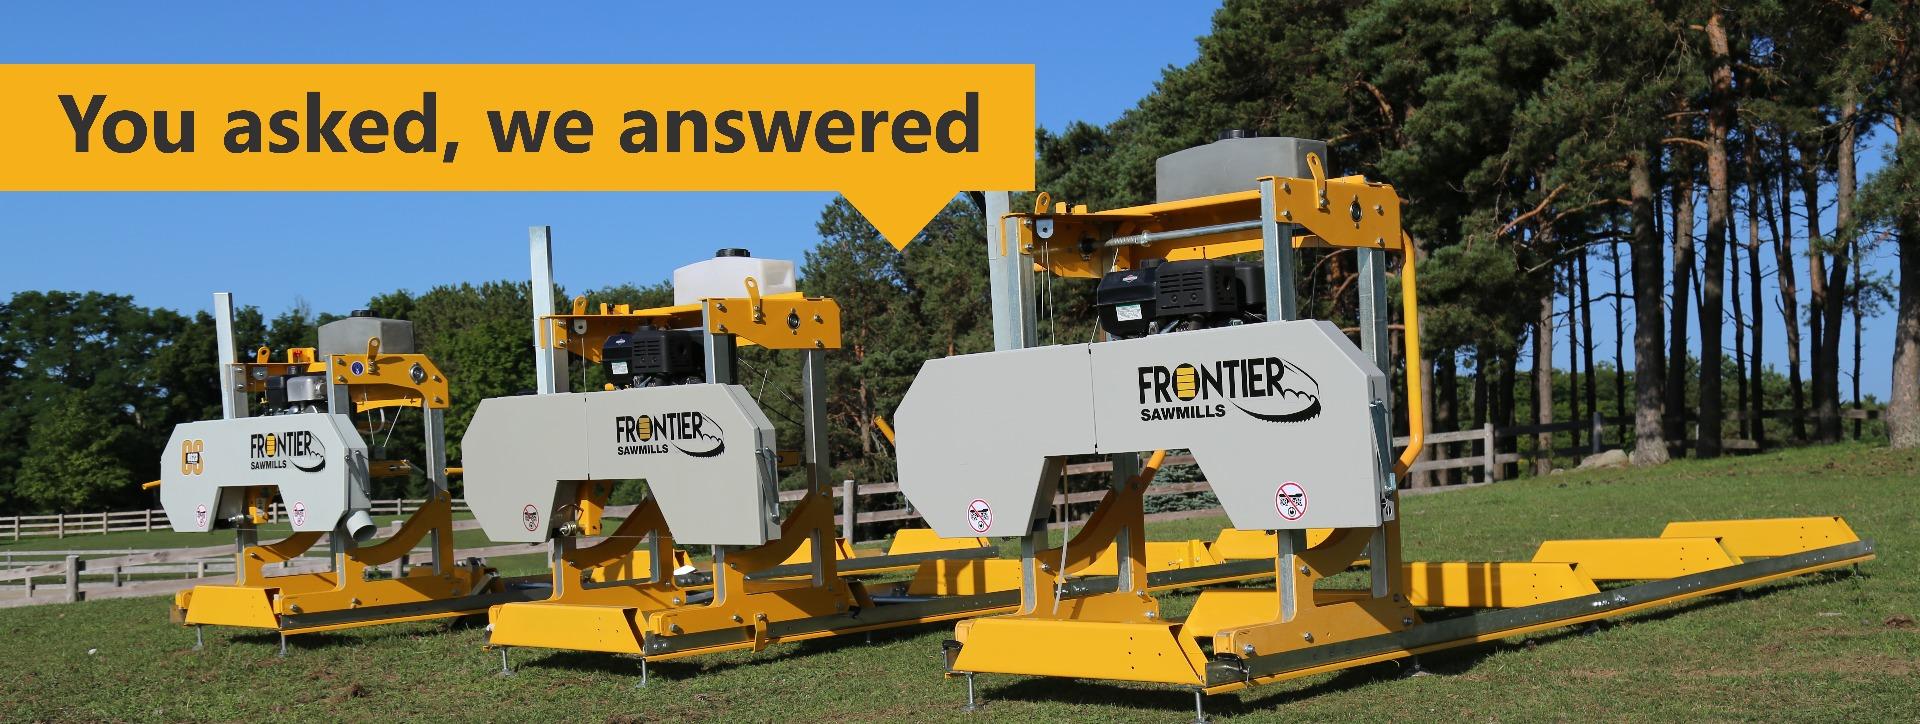 frontier sawmills